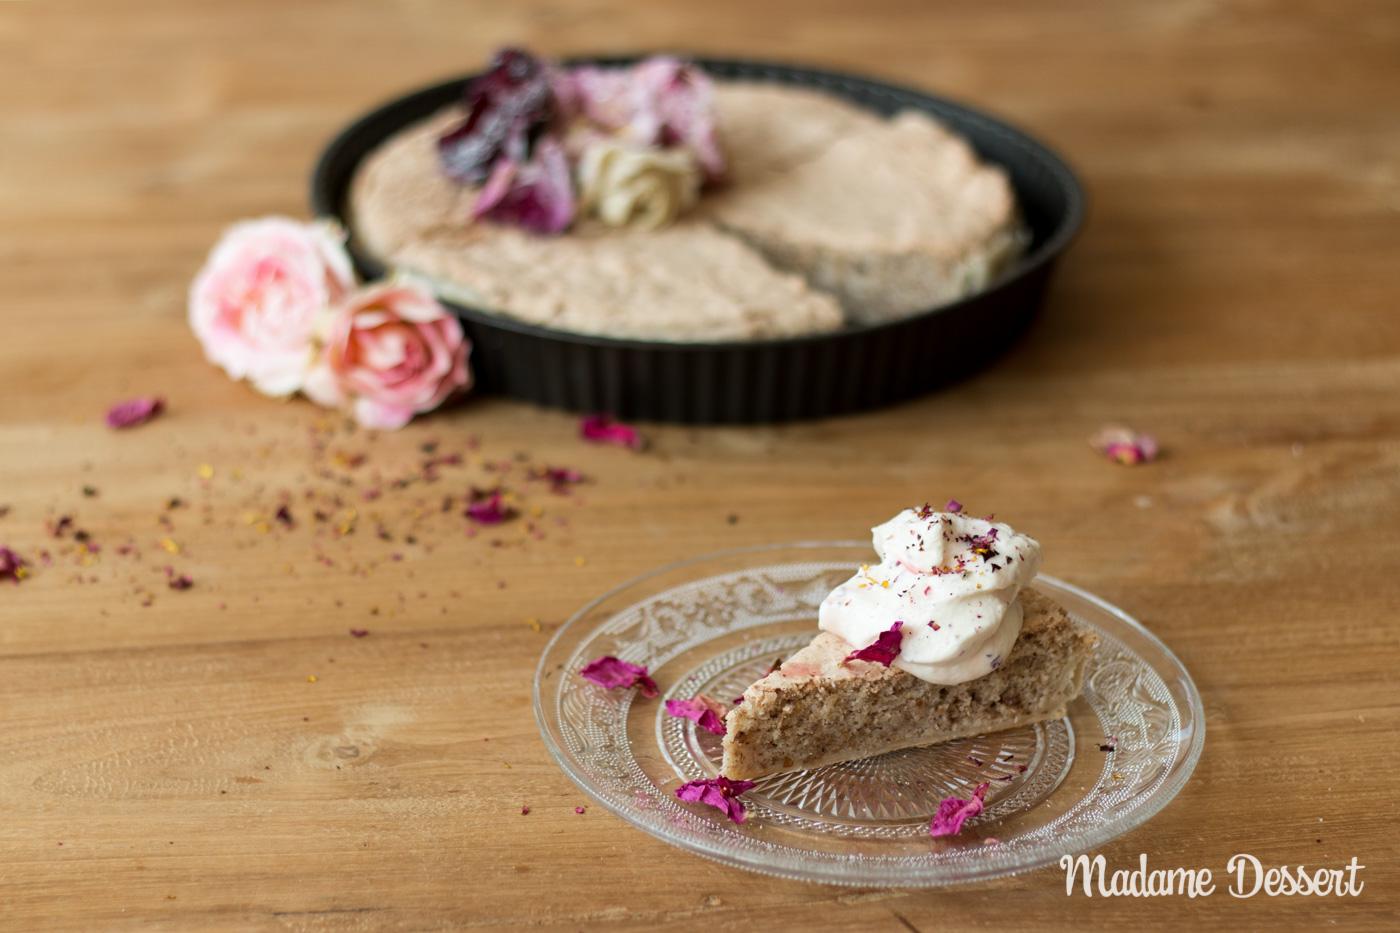 Rosentarte | Madame Dessert